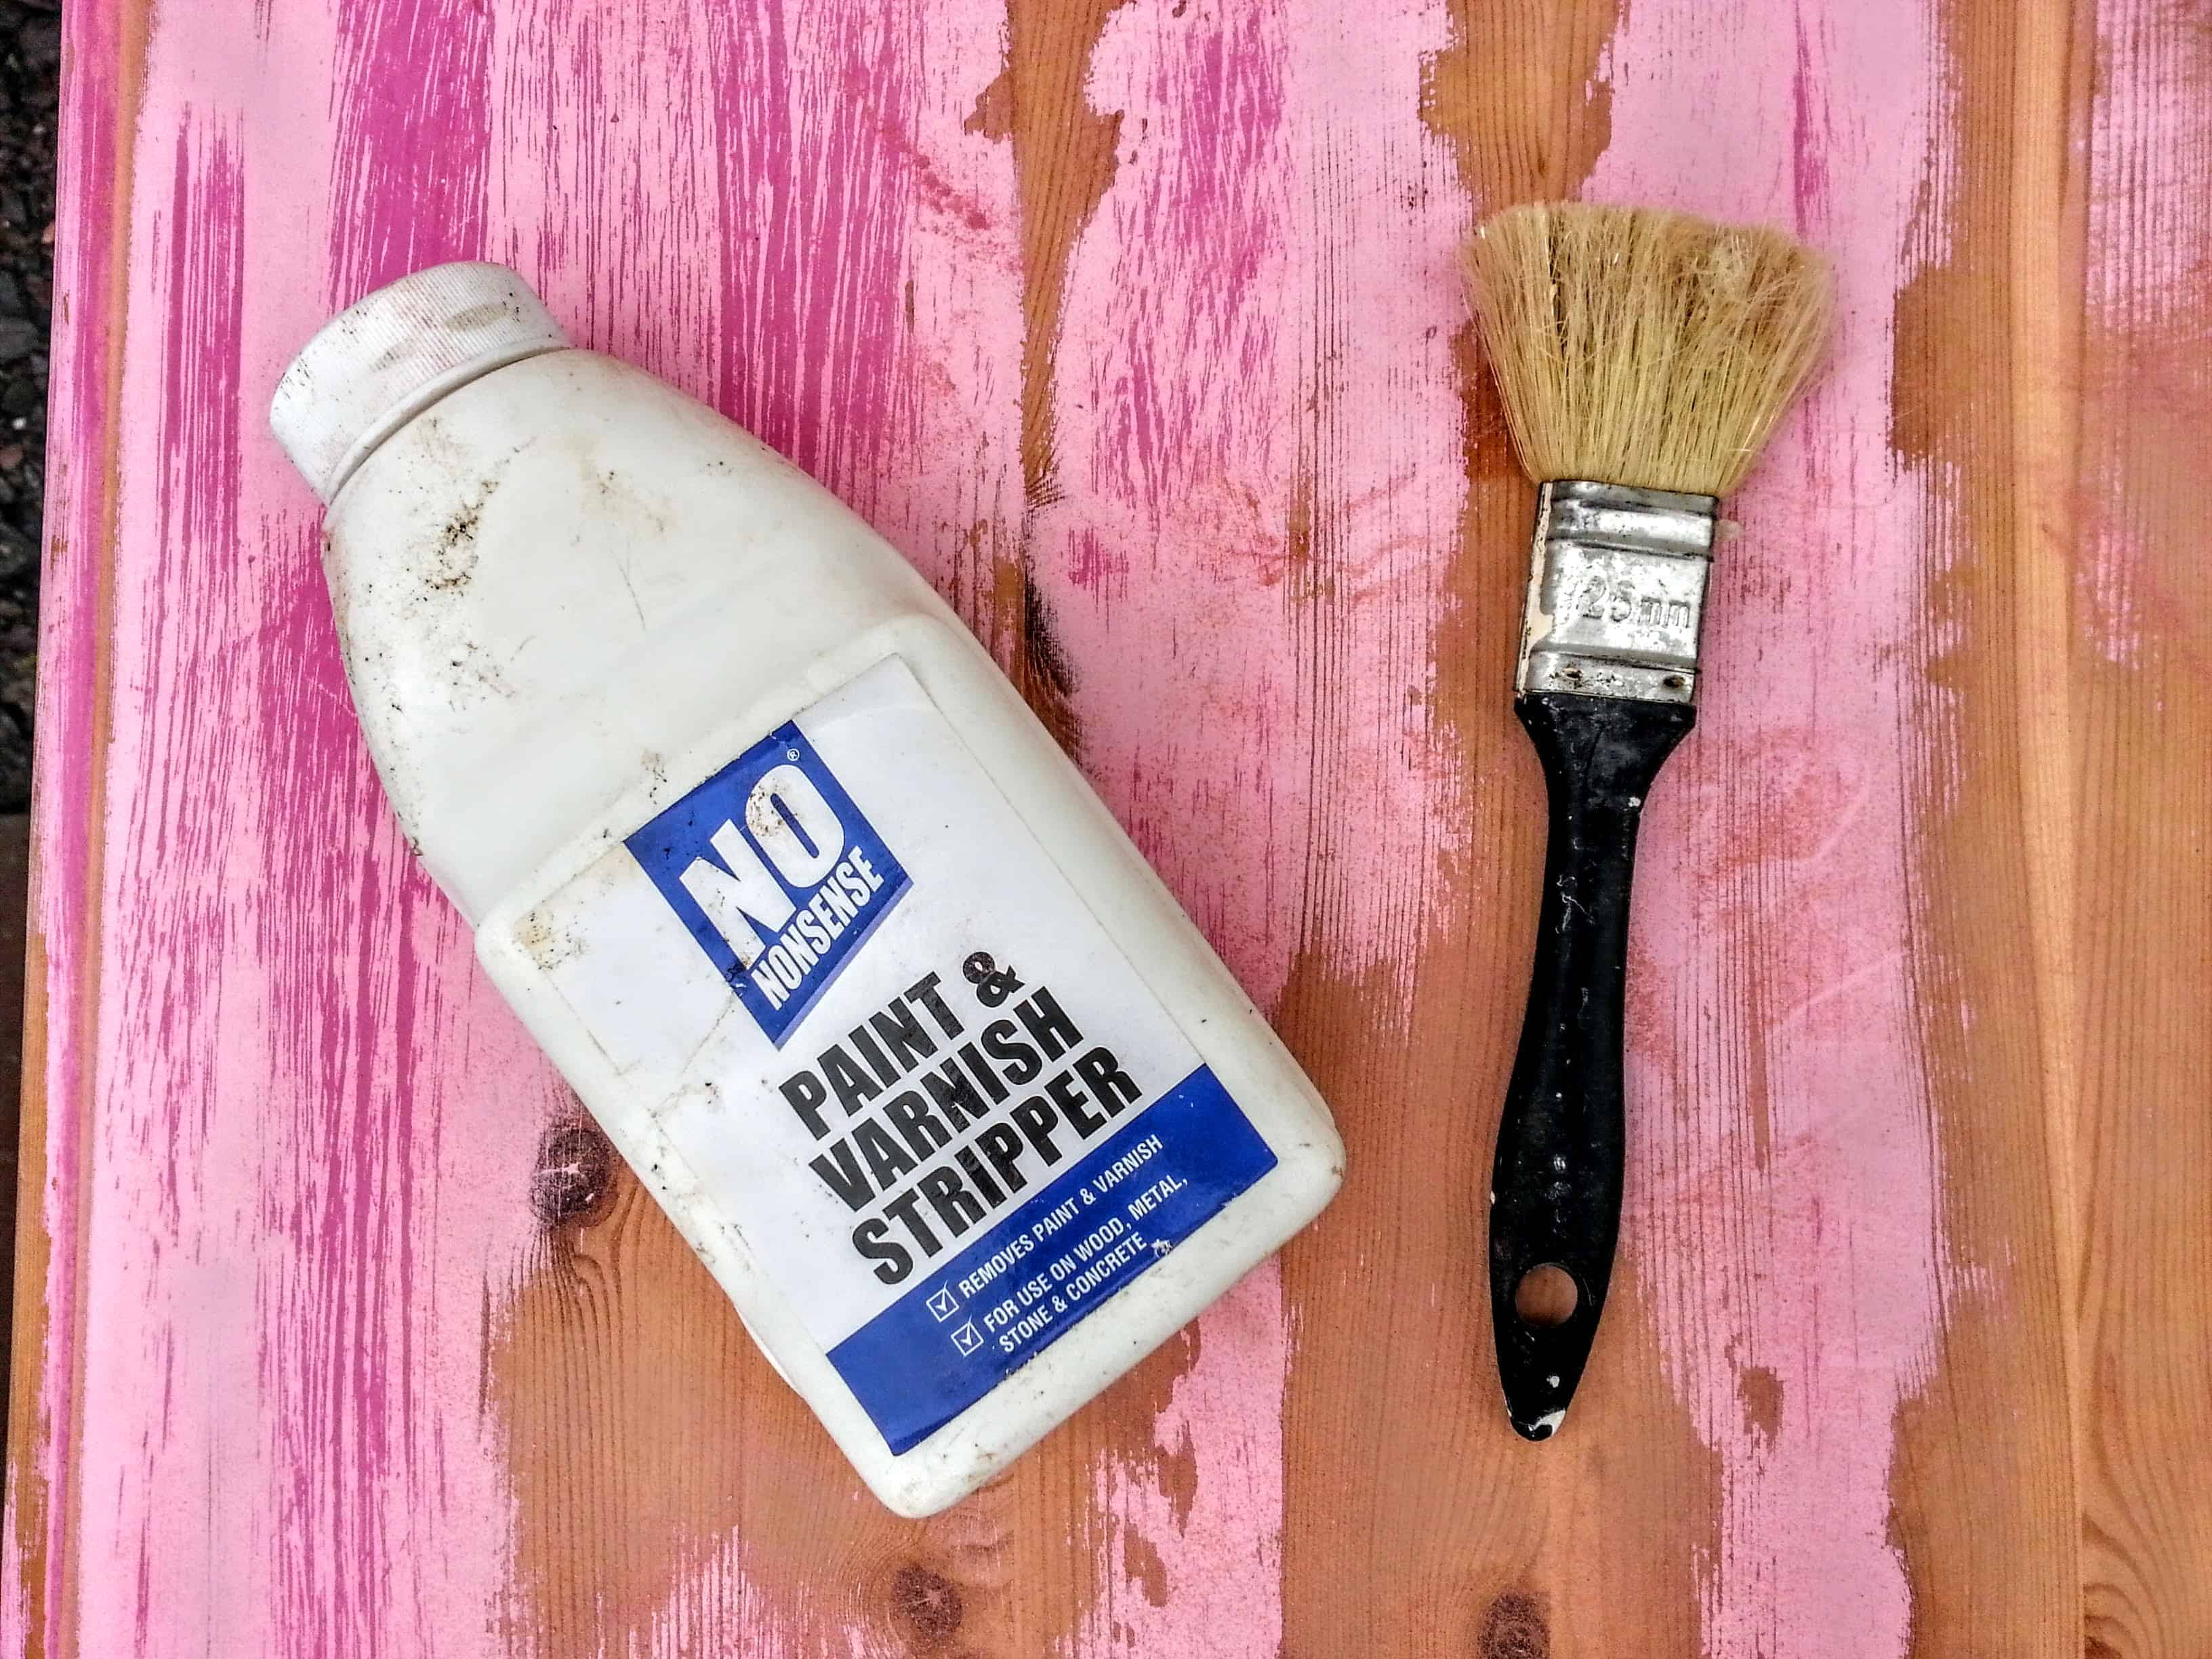 Screwfix's Paint & Varnish Stripper – First Impressions